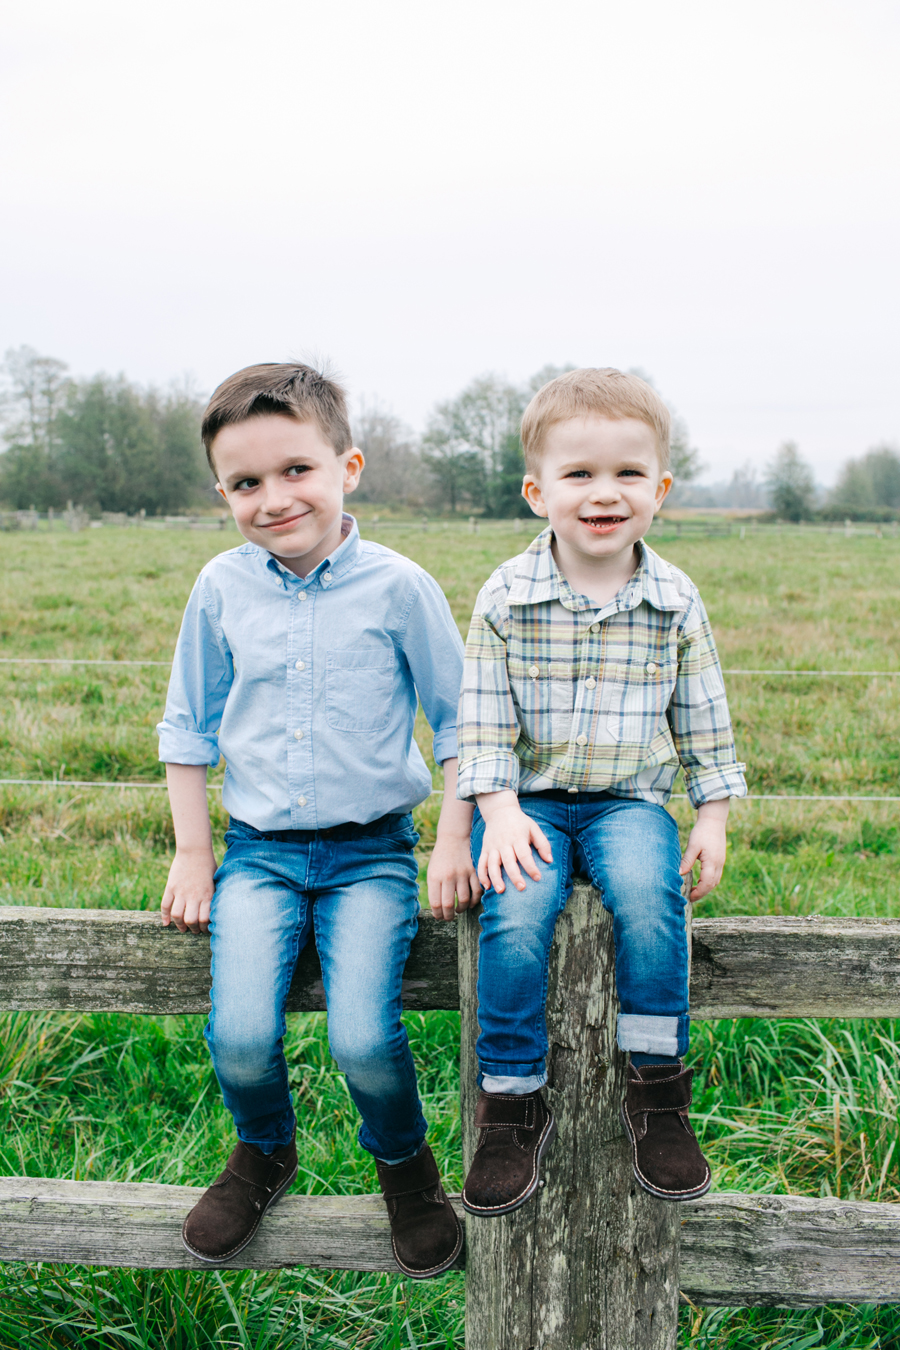 002-bellingham-family-photographer-hovander-park-burdick-katheryn-moran-photography.jpg